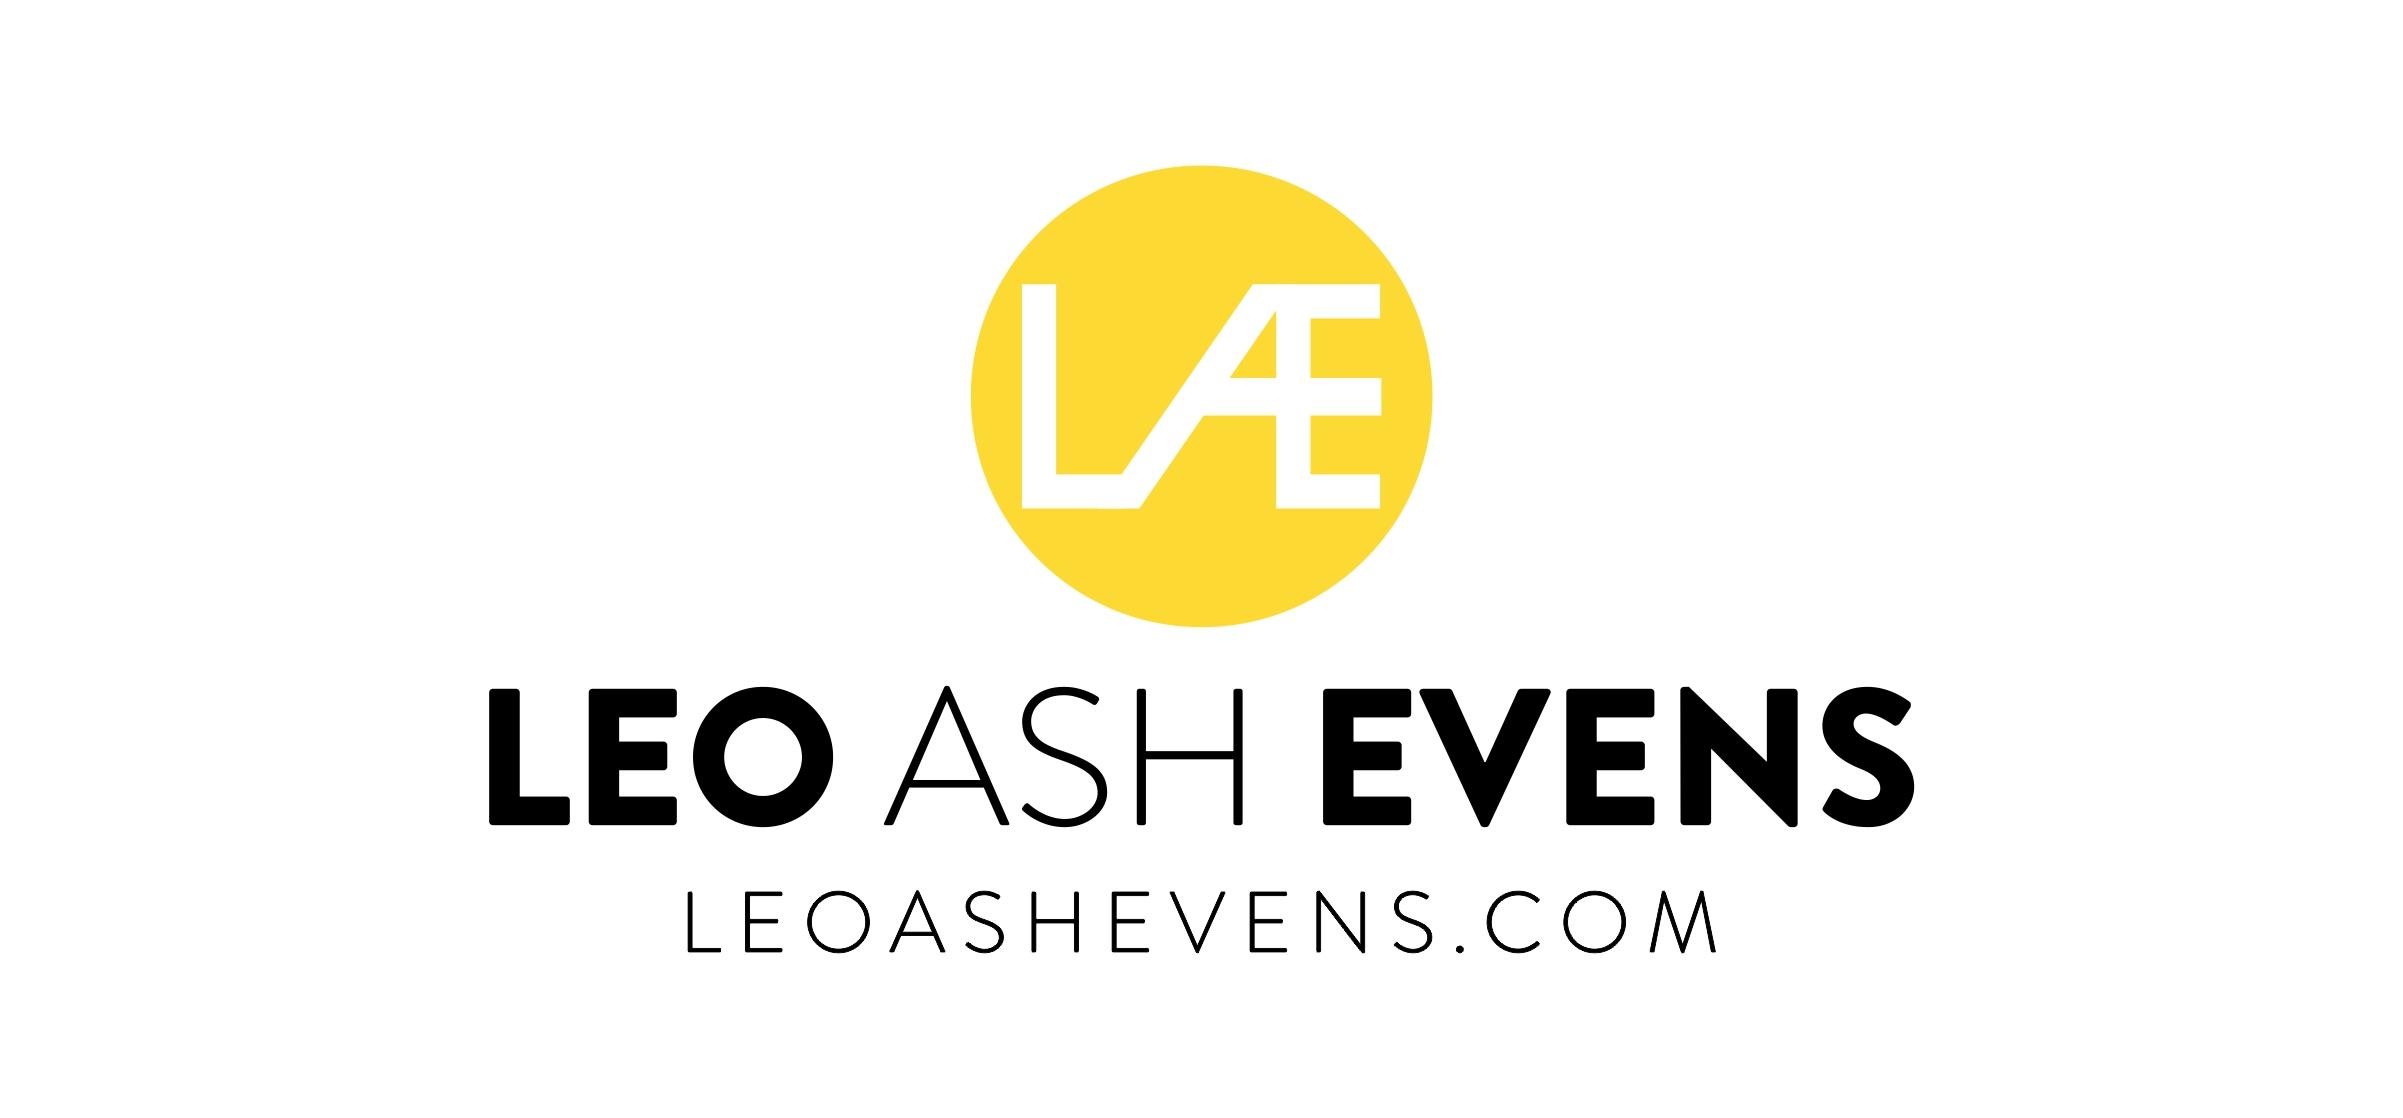 Leo Ash Evens Branding